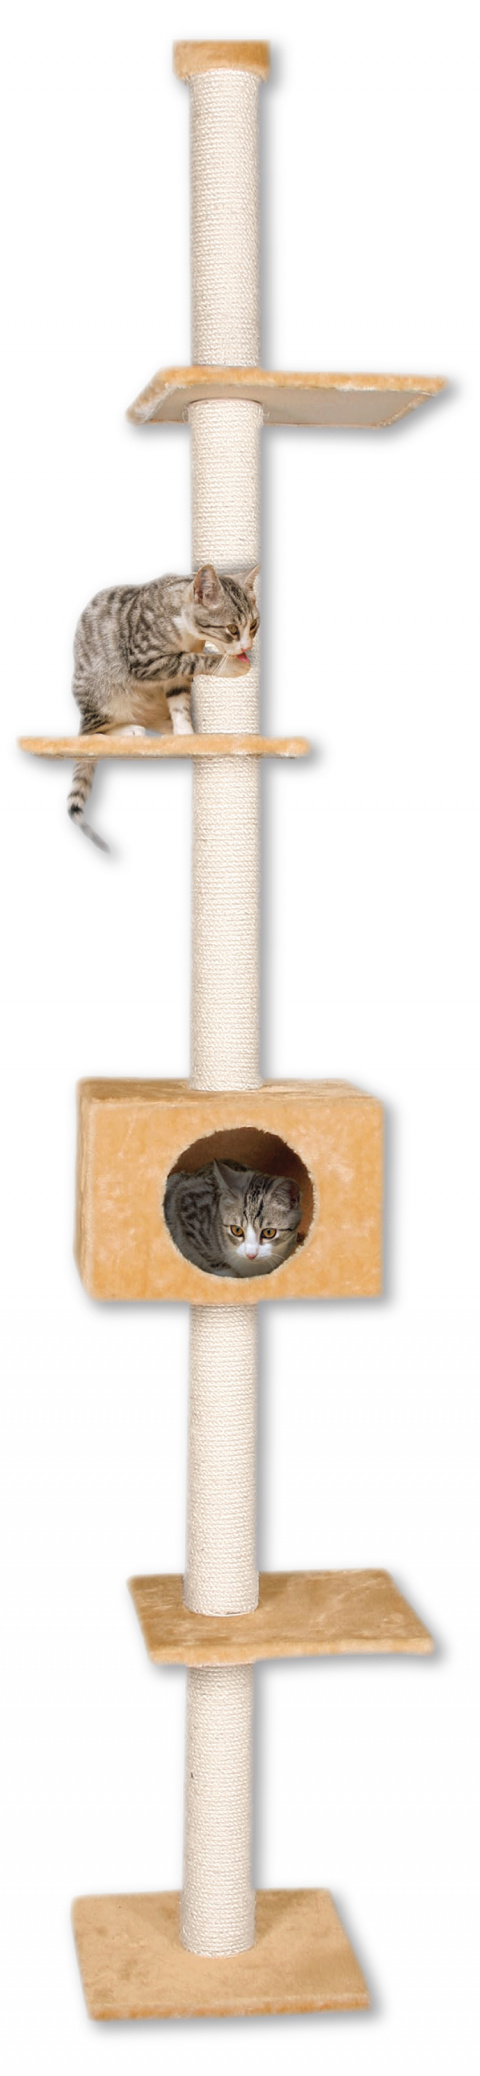 Odpočívadlo Magic Cat Adela béžové 285cm title=